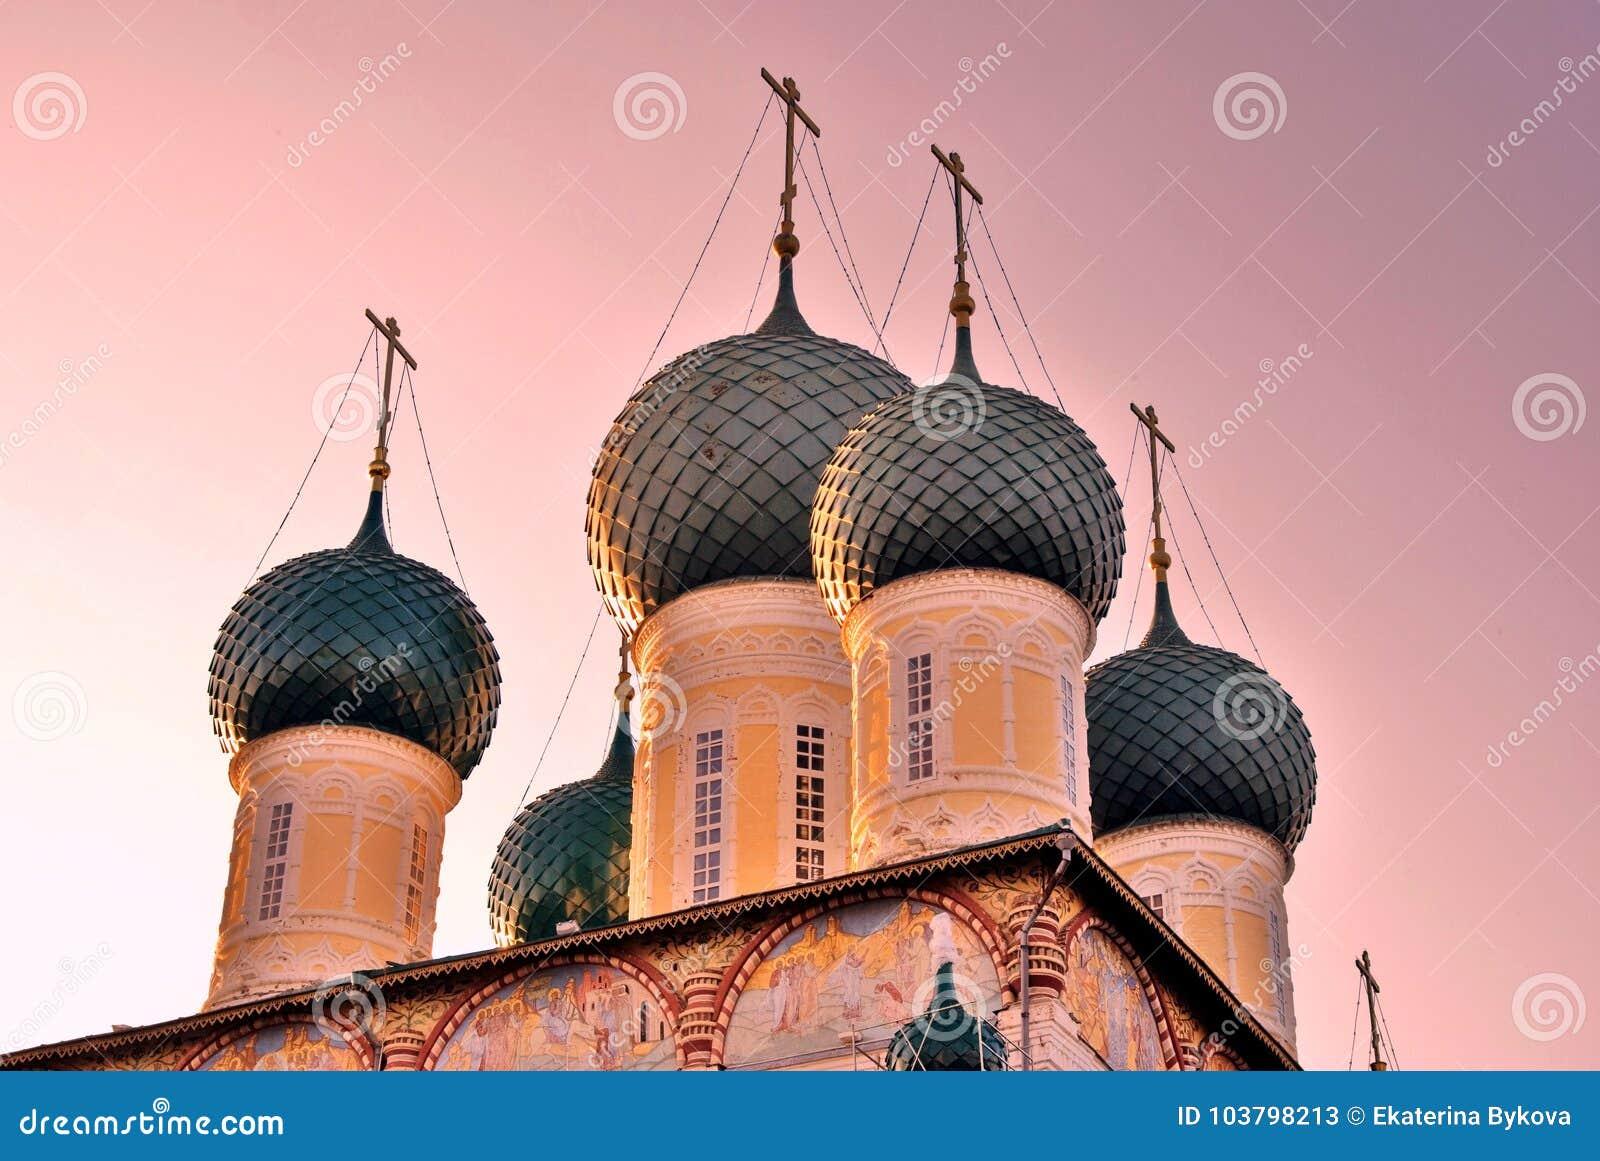 Resurrection Cathedral Tutaev: photos, address and history 59